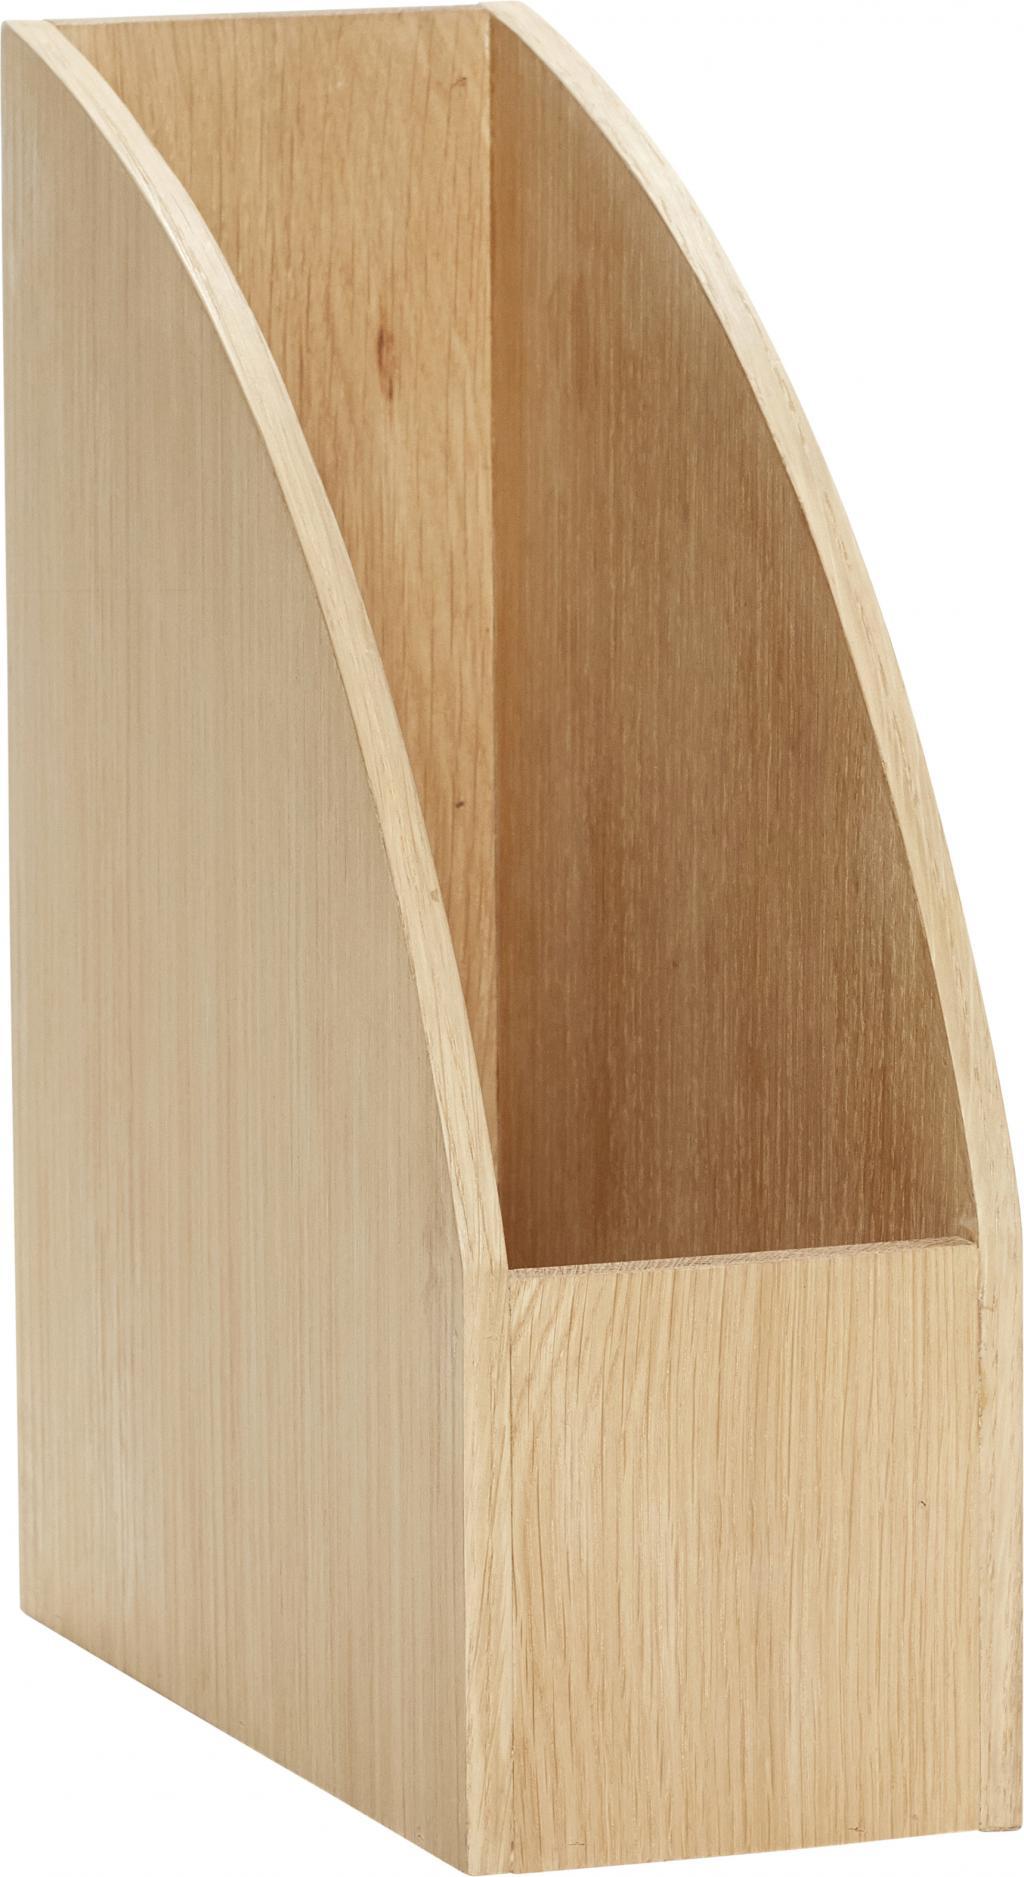 tijdschriftenhouder-eikenhout---naturel---hubsch[0].jpg